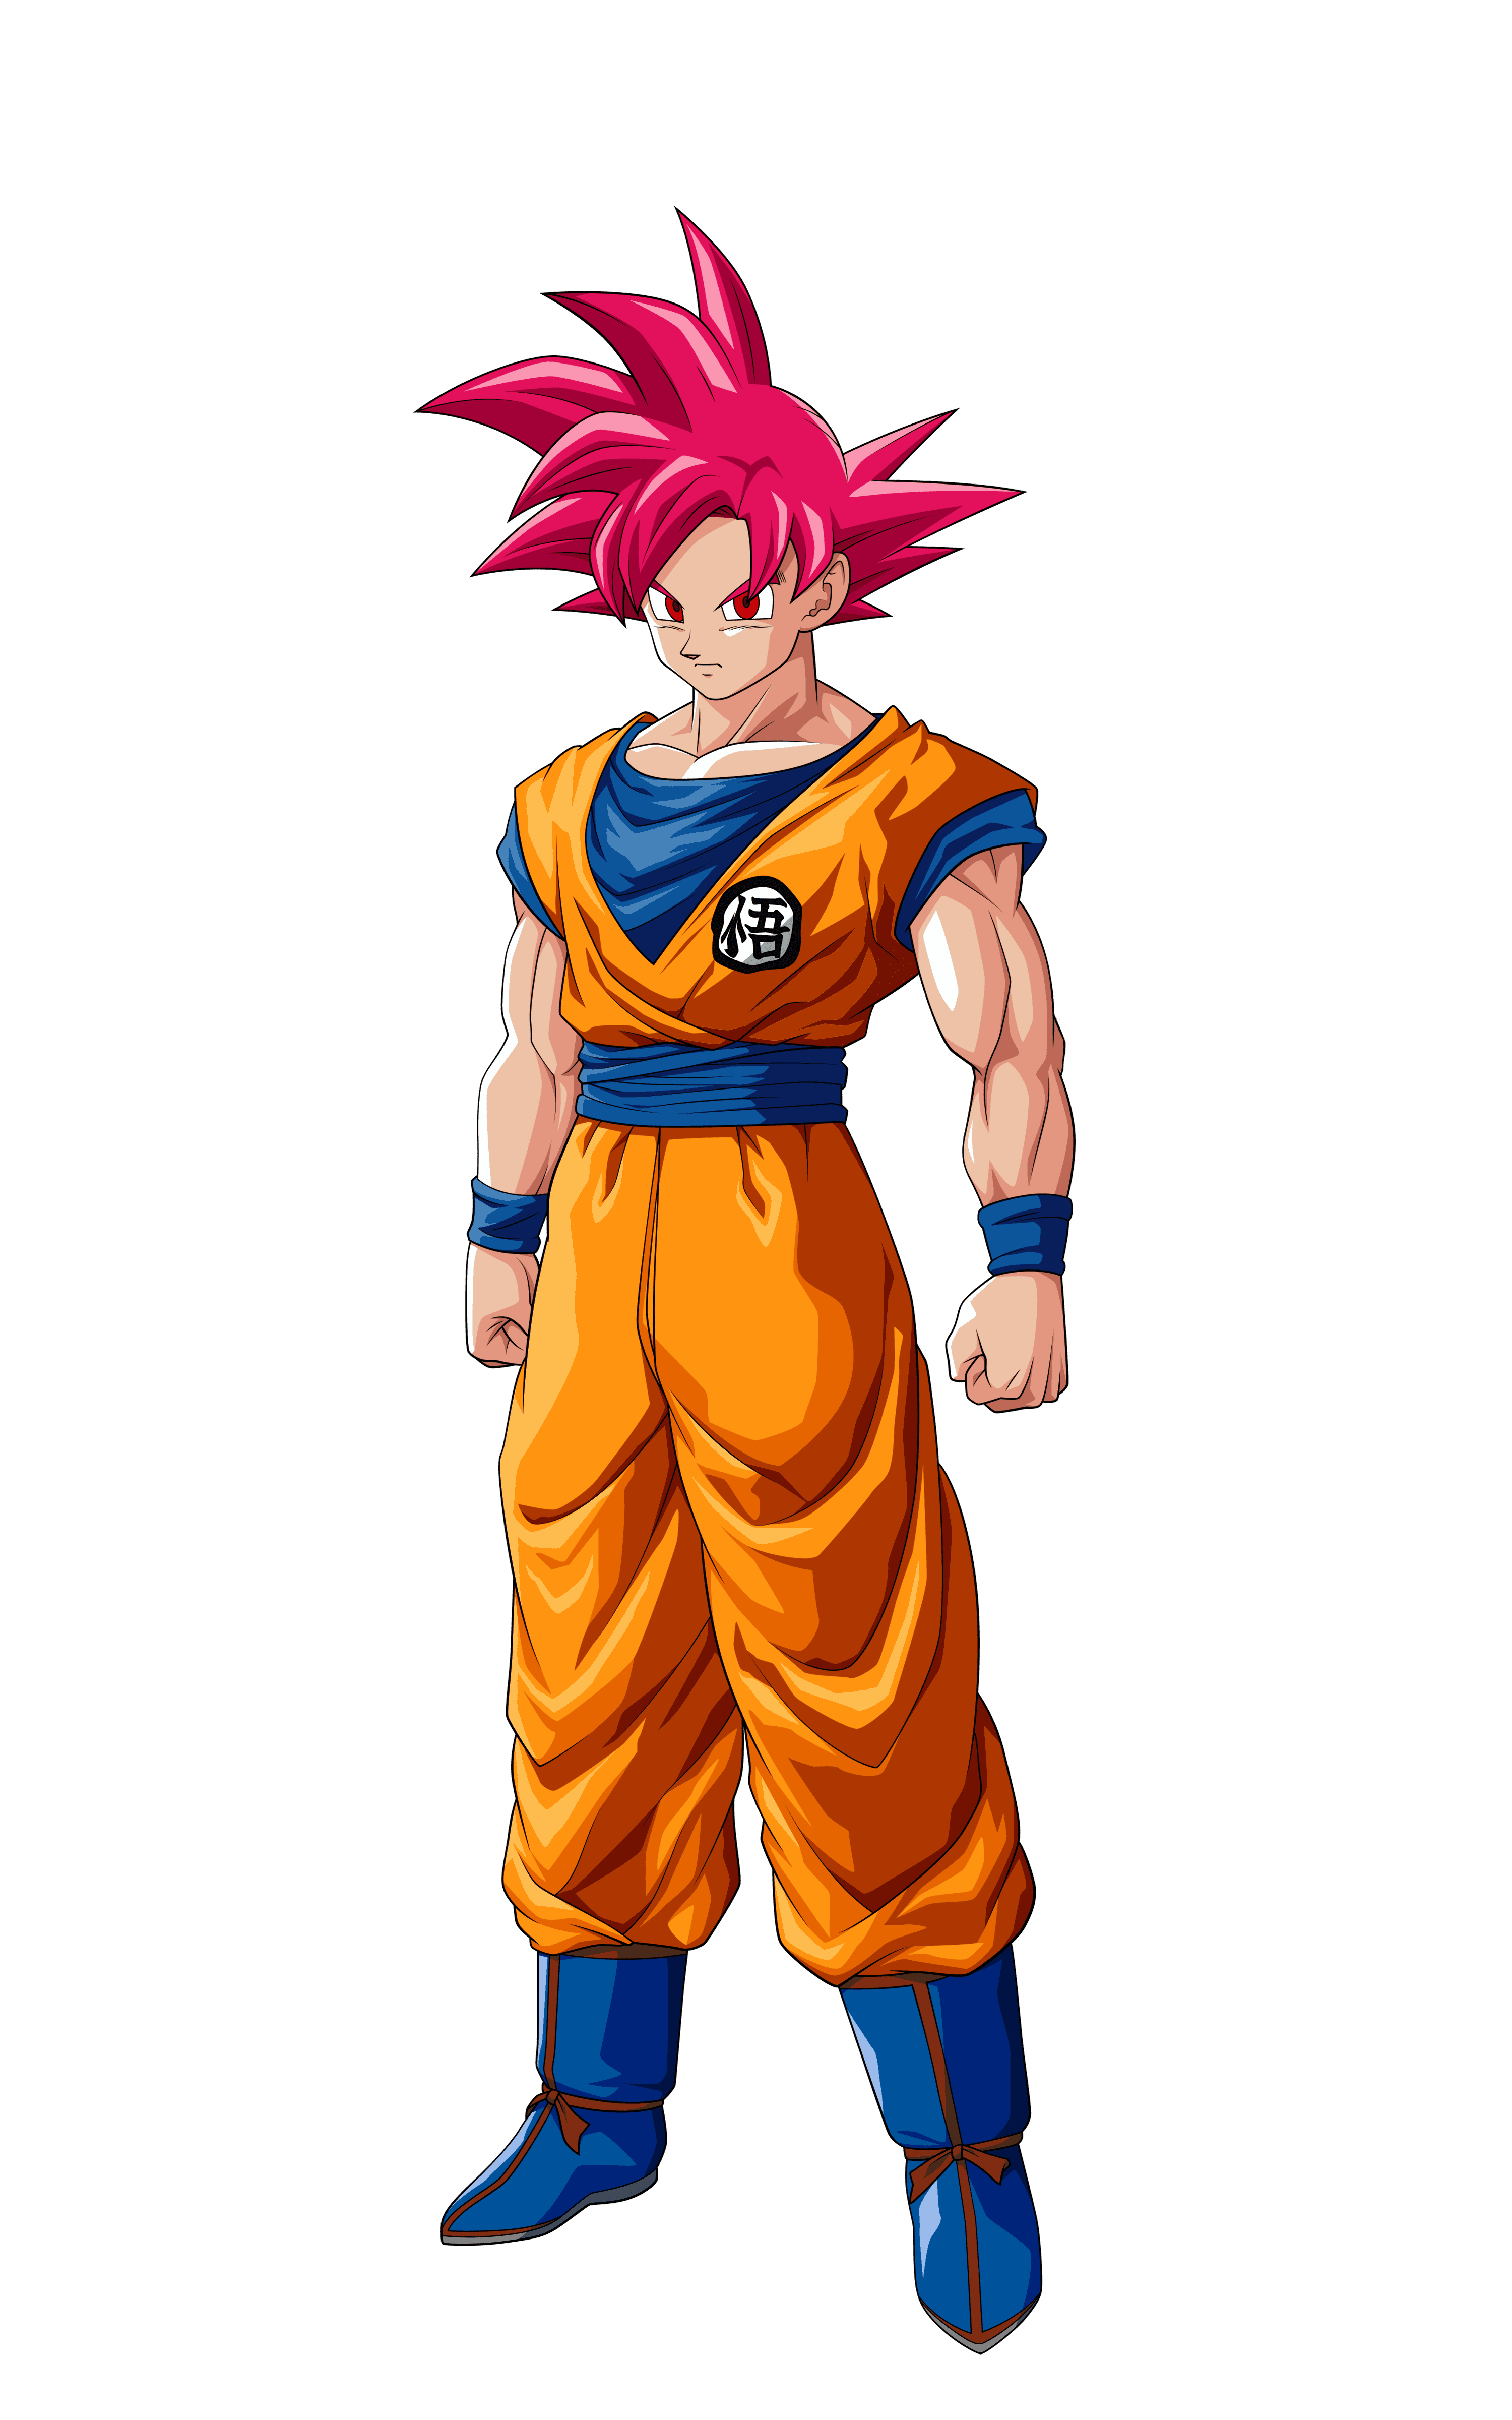 Son Goku Ssg Render 2 Dbz Kakarot By Maxiuchiha22 On Deviantart Goku Super Saiyan God Anime Dragon Ball Super Dragon Ball Super Goku